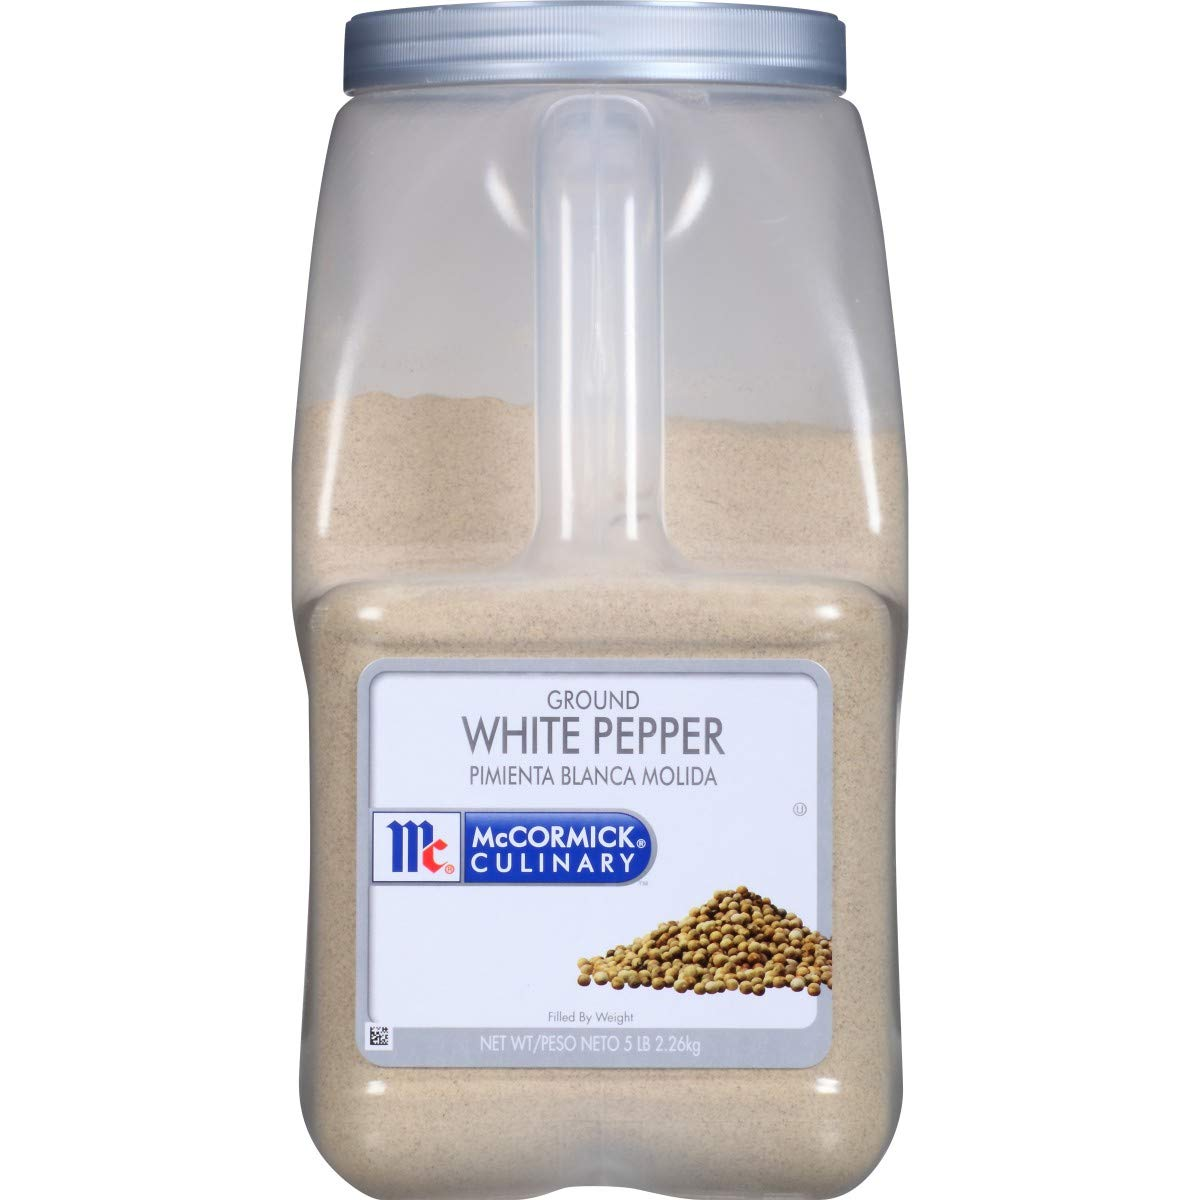 McCormick Ground White Pepper - 5 lb. container, 3 per case